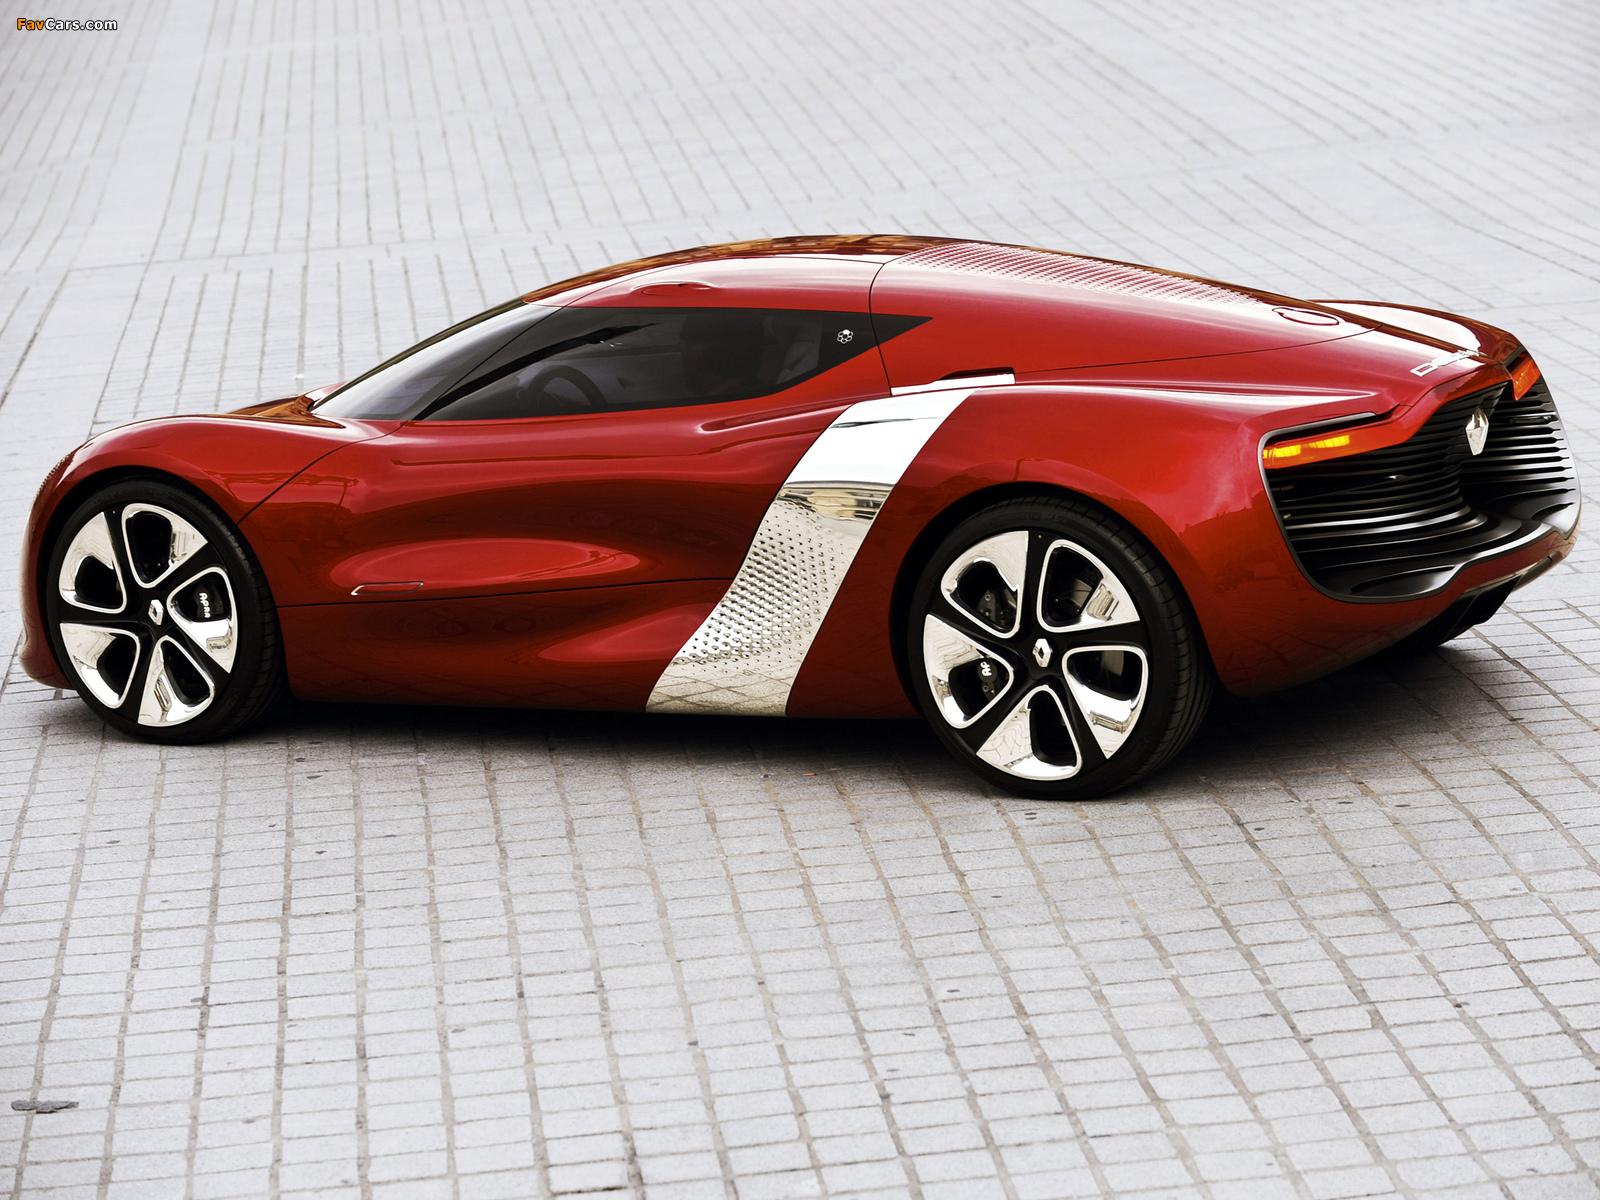 Renault DeZir Concept 2010 photos (1600 x 1200)